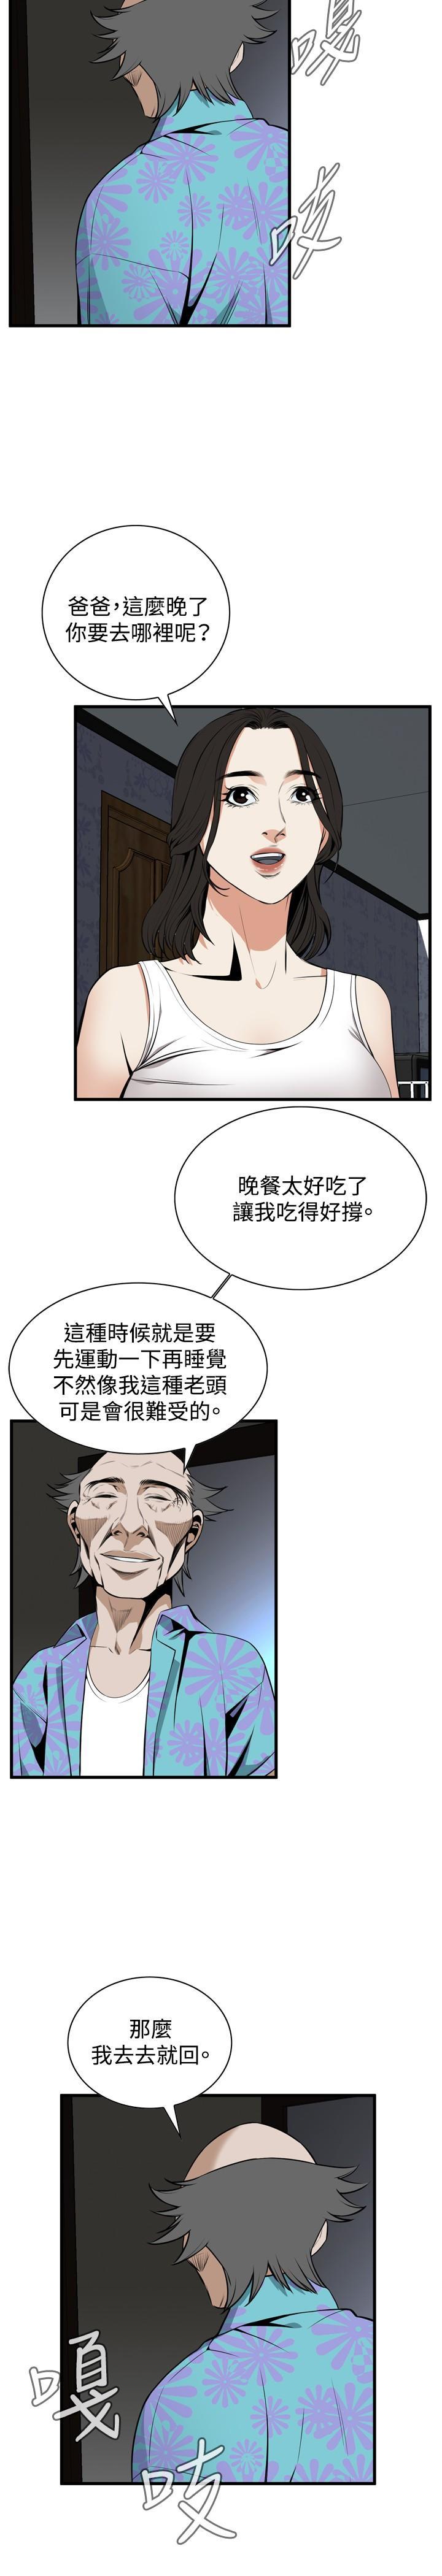 Take a Peek 偷窥 Ch.39~51 [Chinese]中文 141